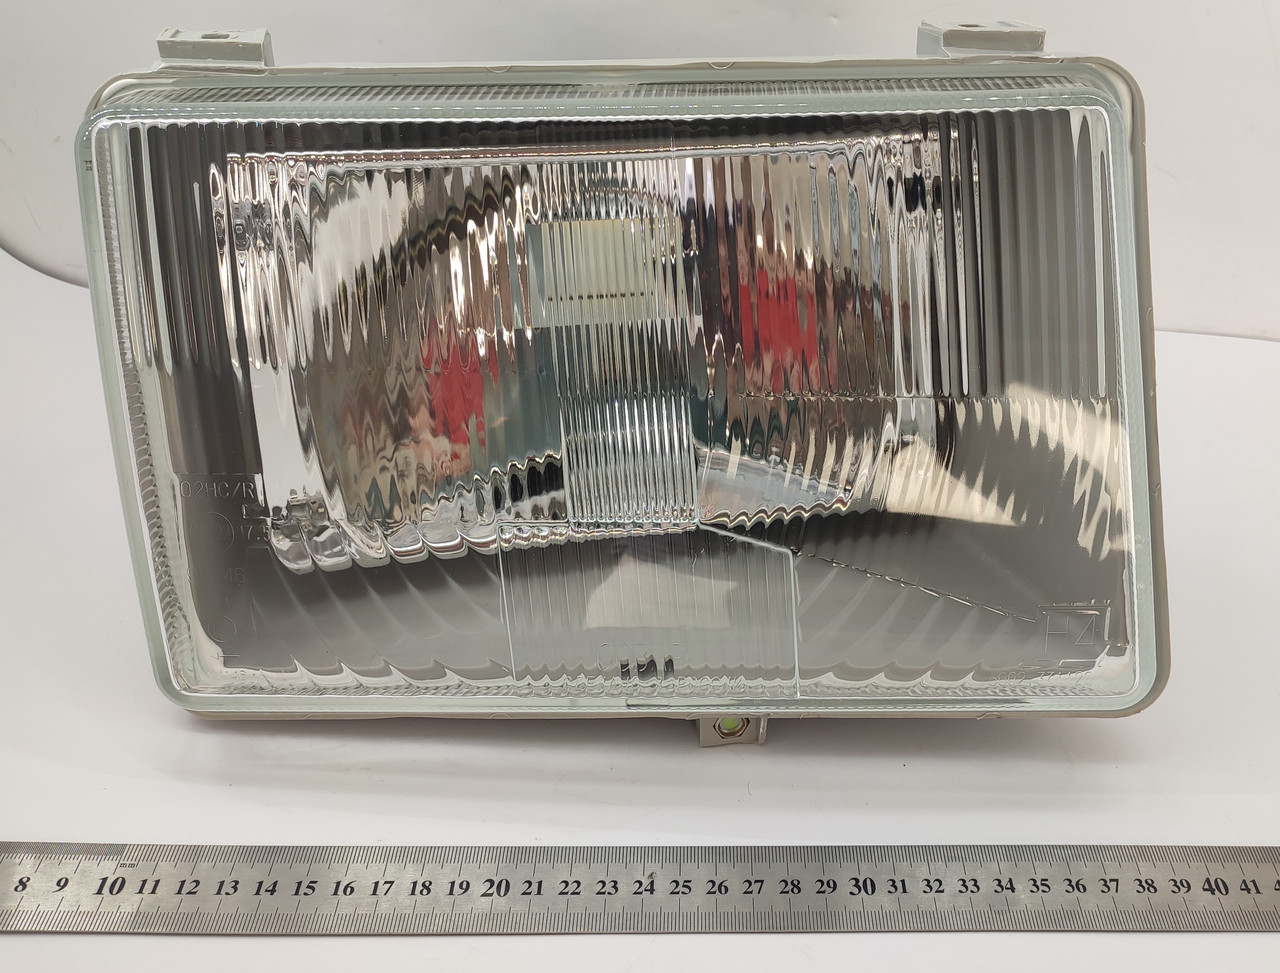 Фара ГАЗЕЛЬ левая (рифленое стекло) ГАЗ 2705, 3302, 3110, ЗИЛ, АЗЛК без лампочки (пр-во ОСВАР)